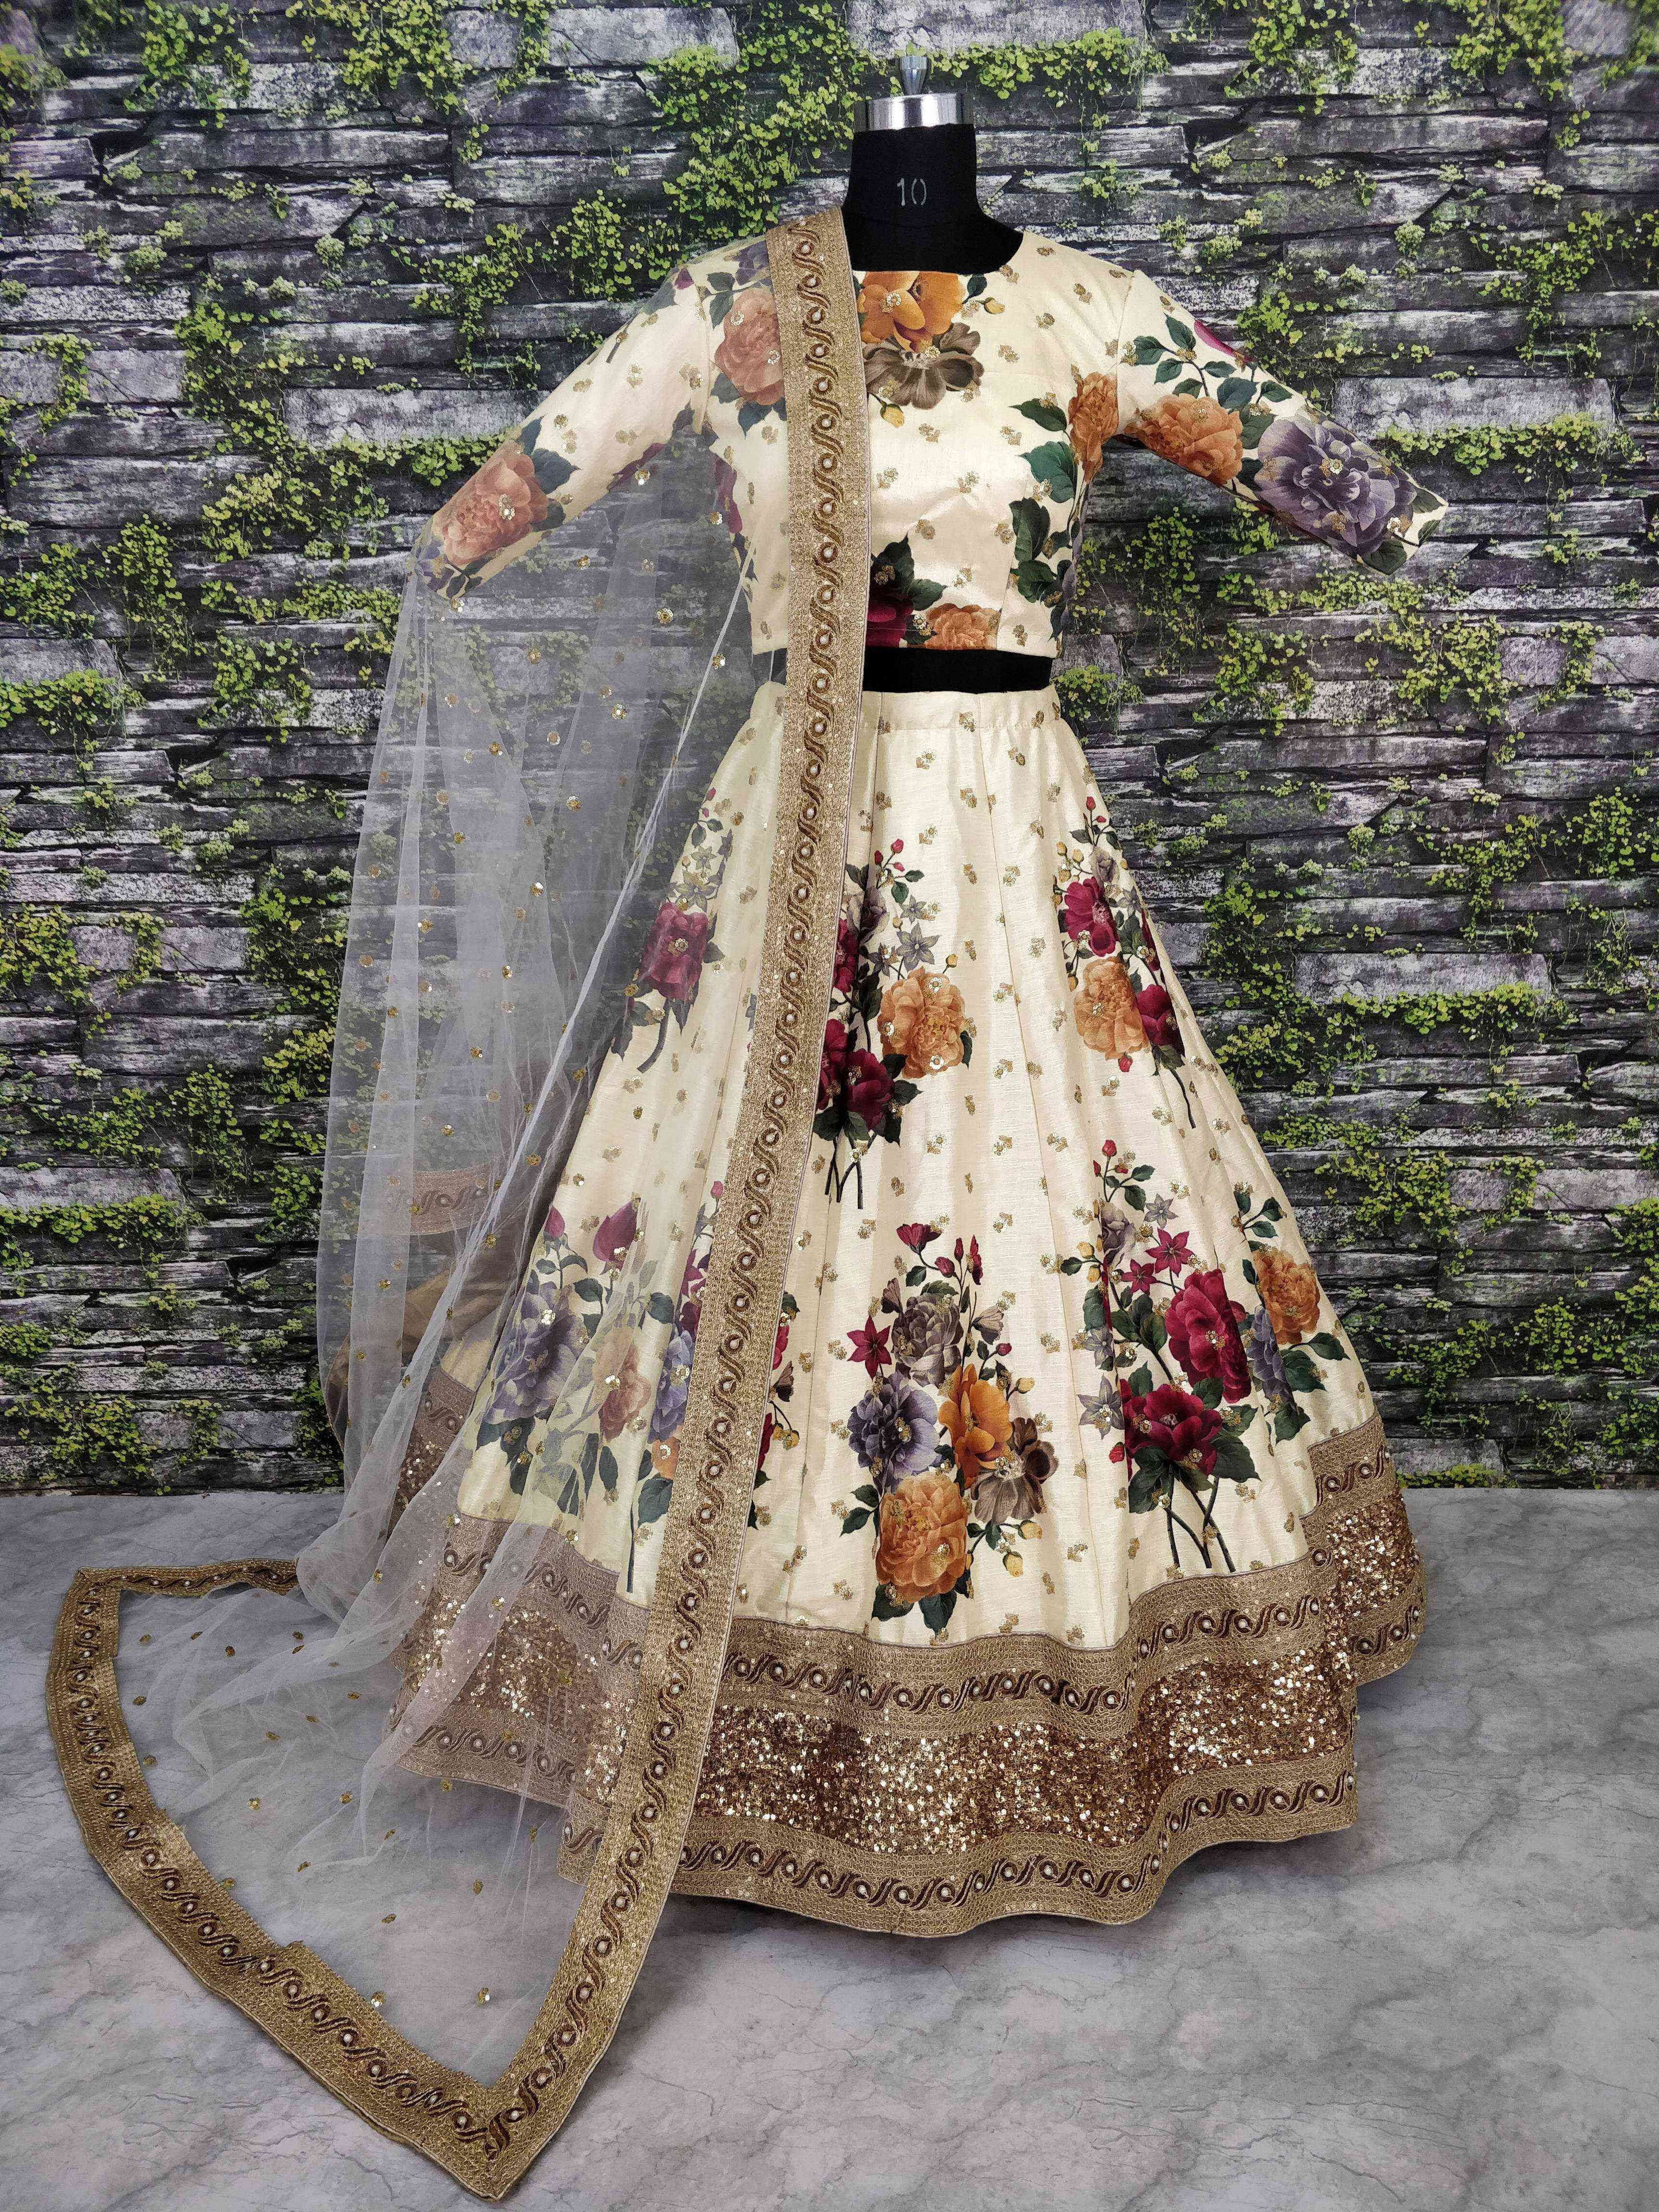 Floral Printed Lehenga Choli Set Designer Lehenga Indian Dress Silk Lengha Wedding Skirt Custom Made Party Wear Dress Ghagra Choli For Women